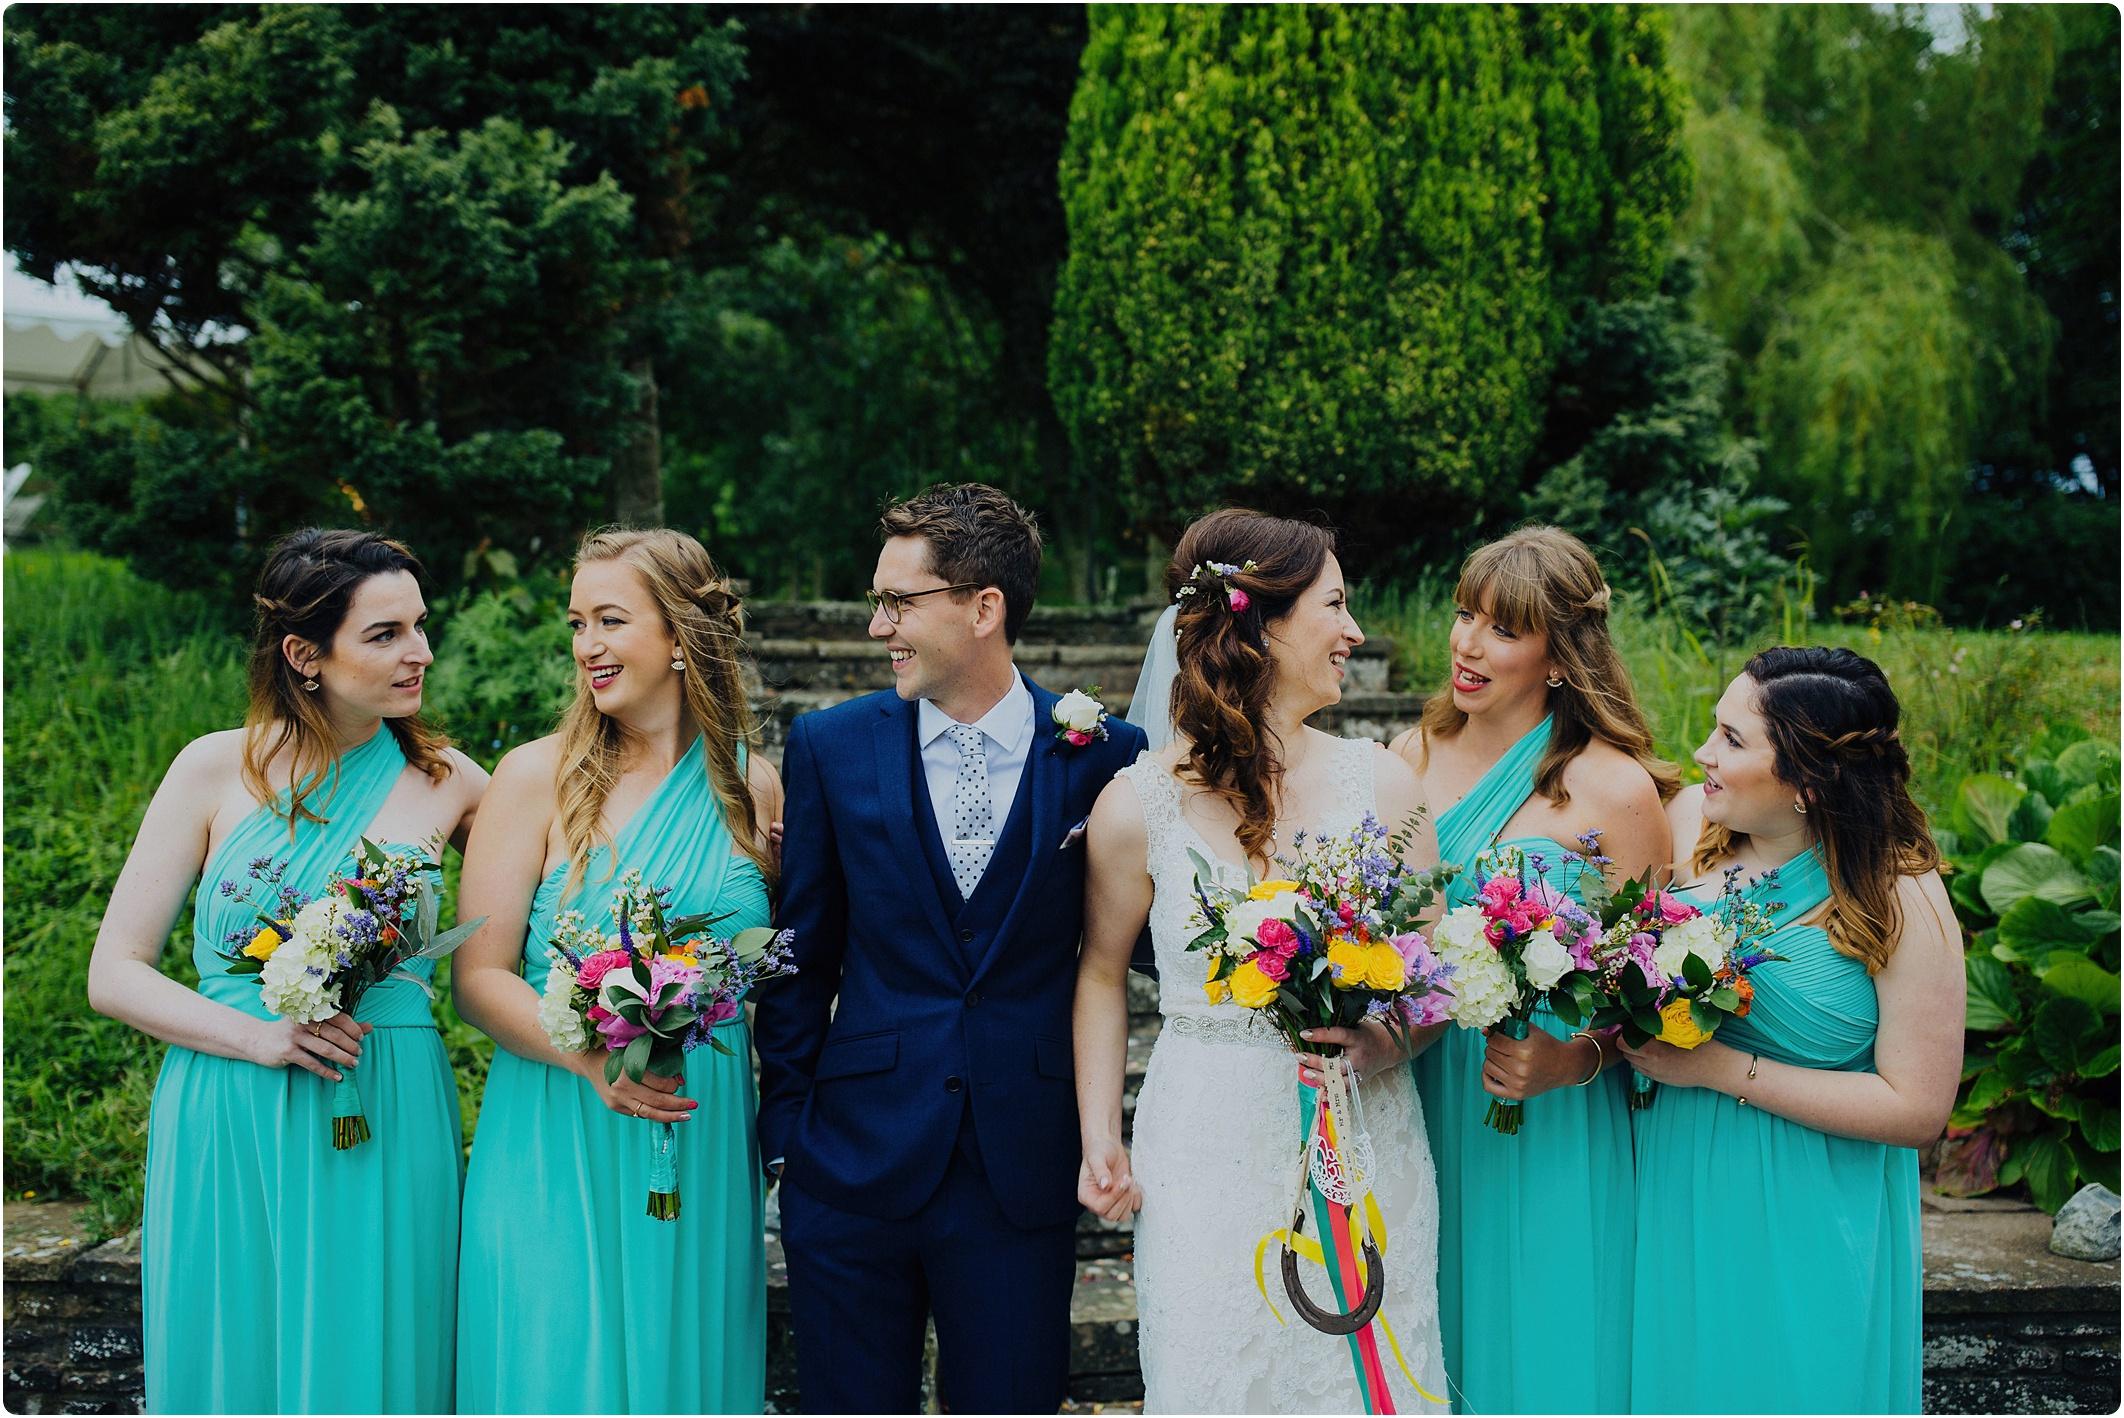 Treadam Barn Wedding groom with bridesmaids